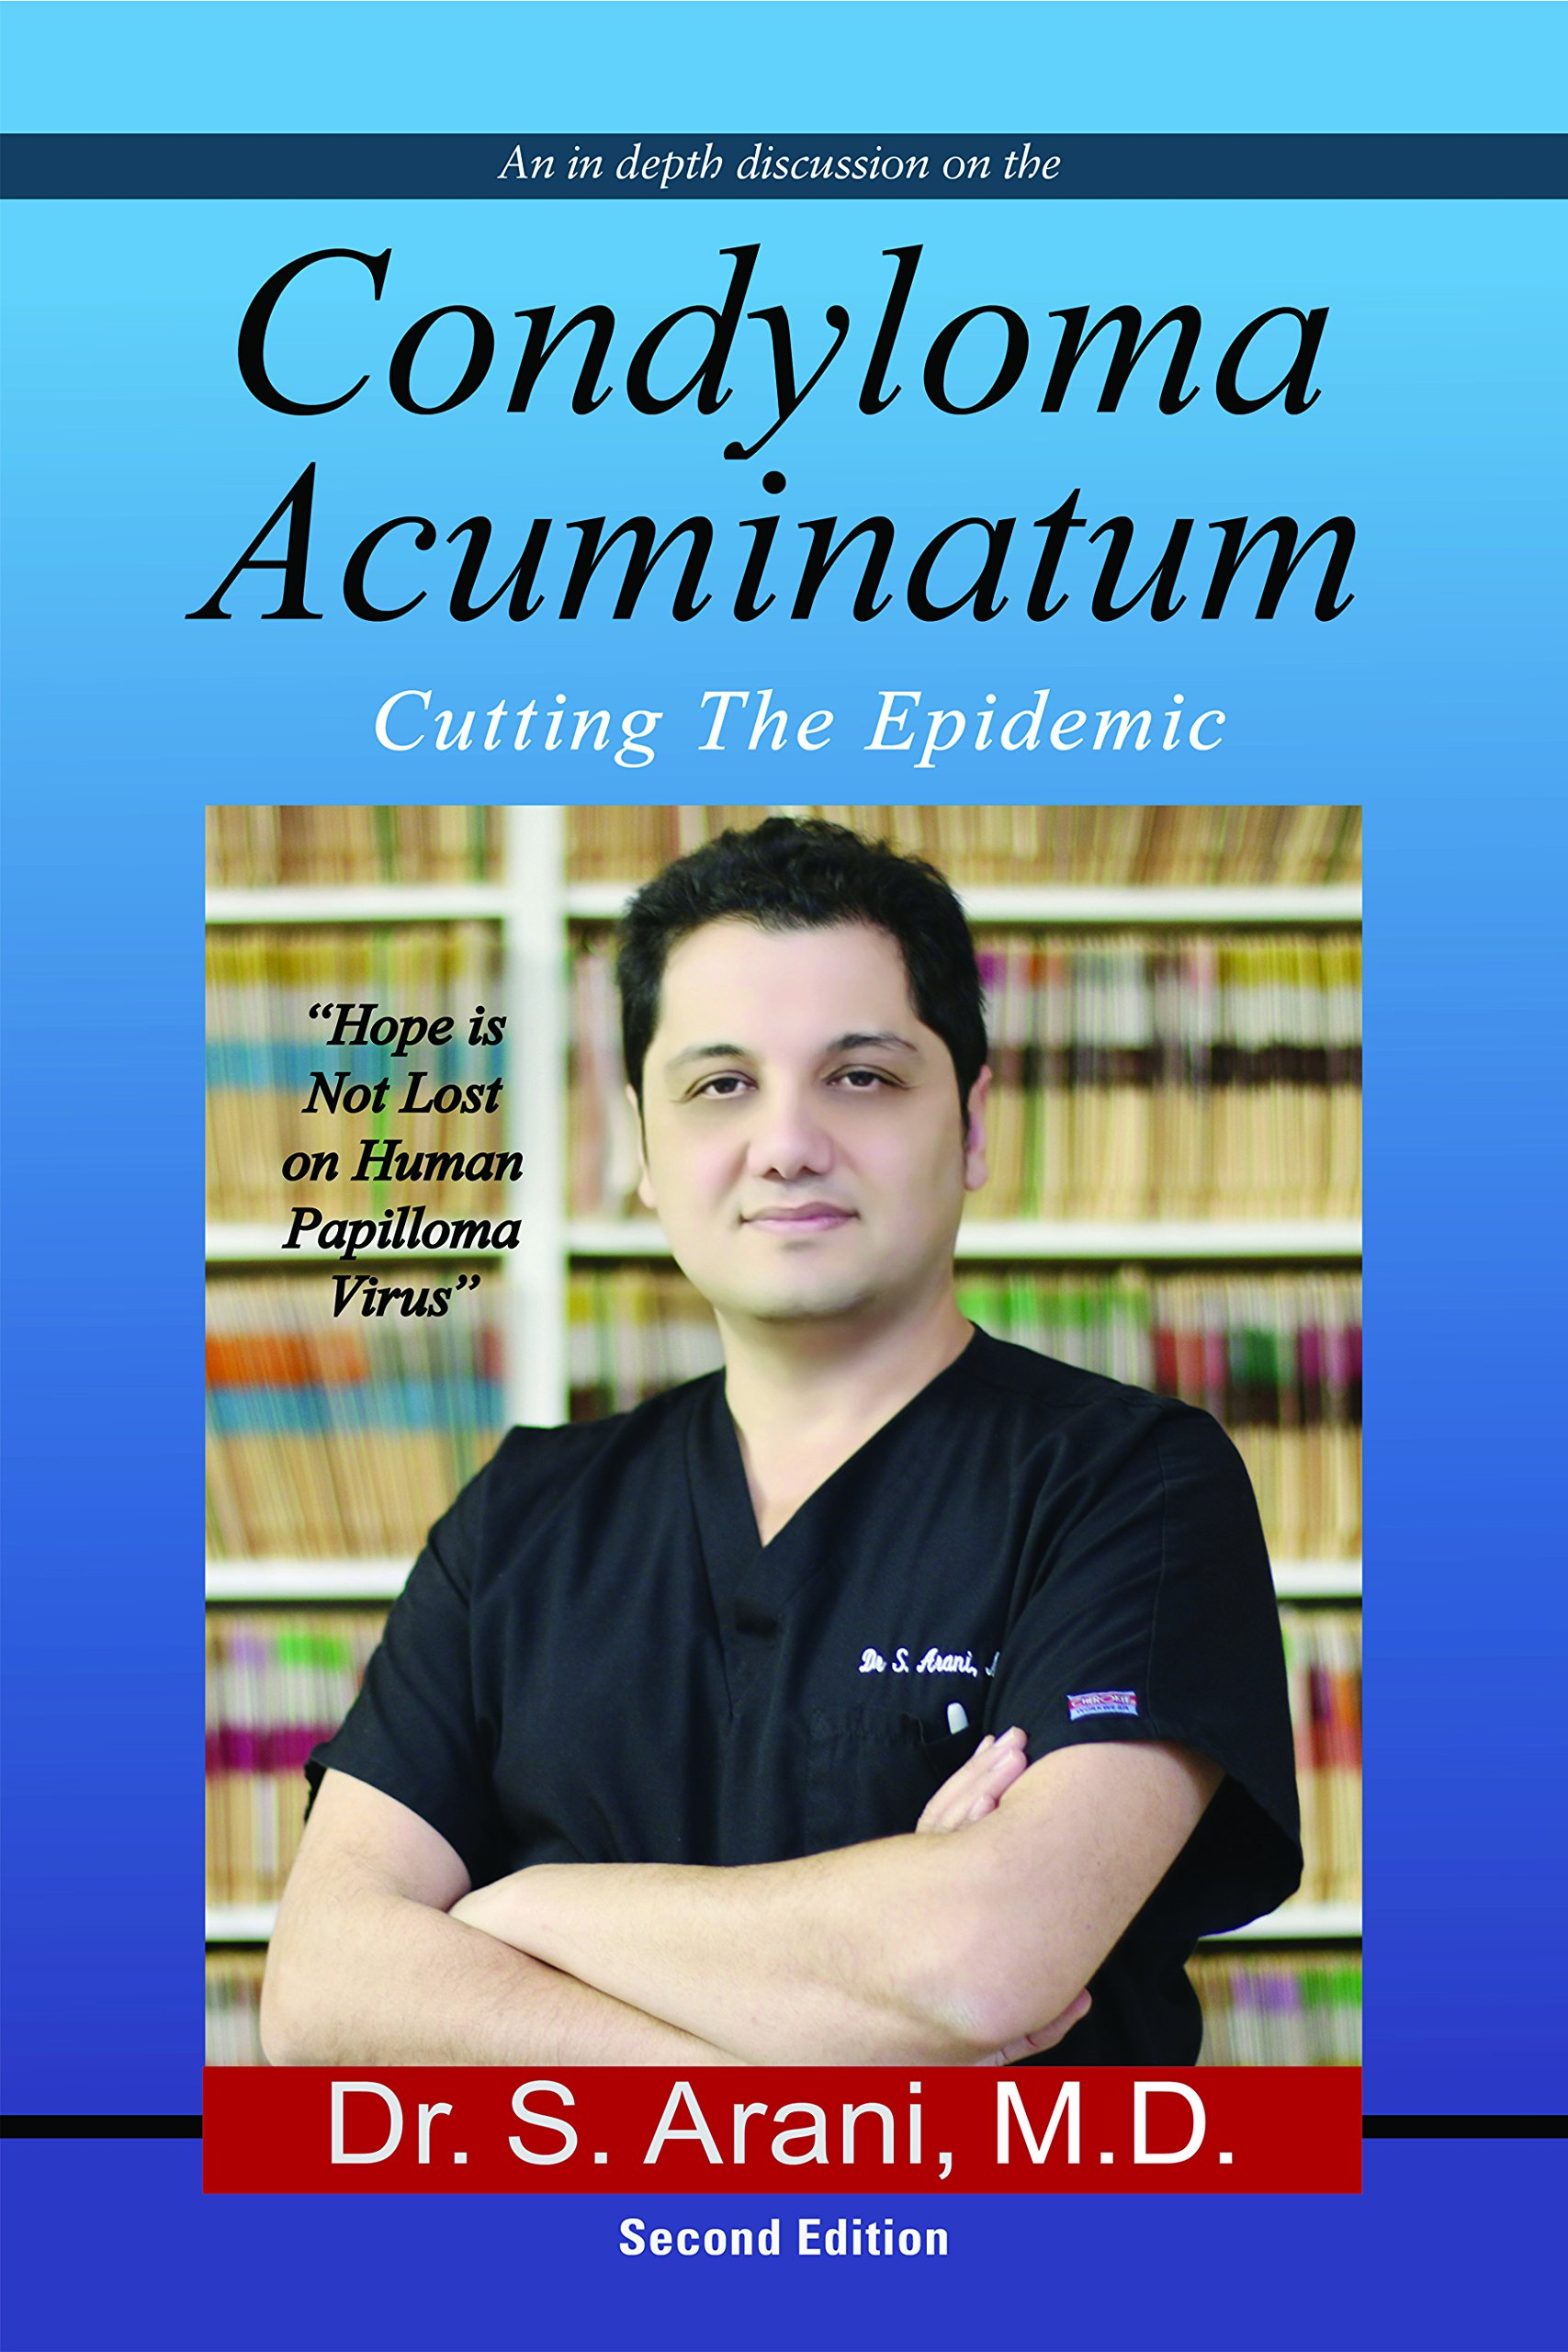 dr ariani-siavash-sasan